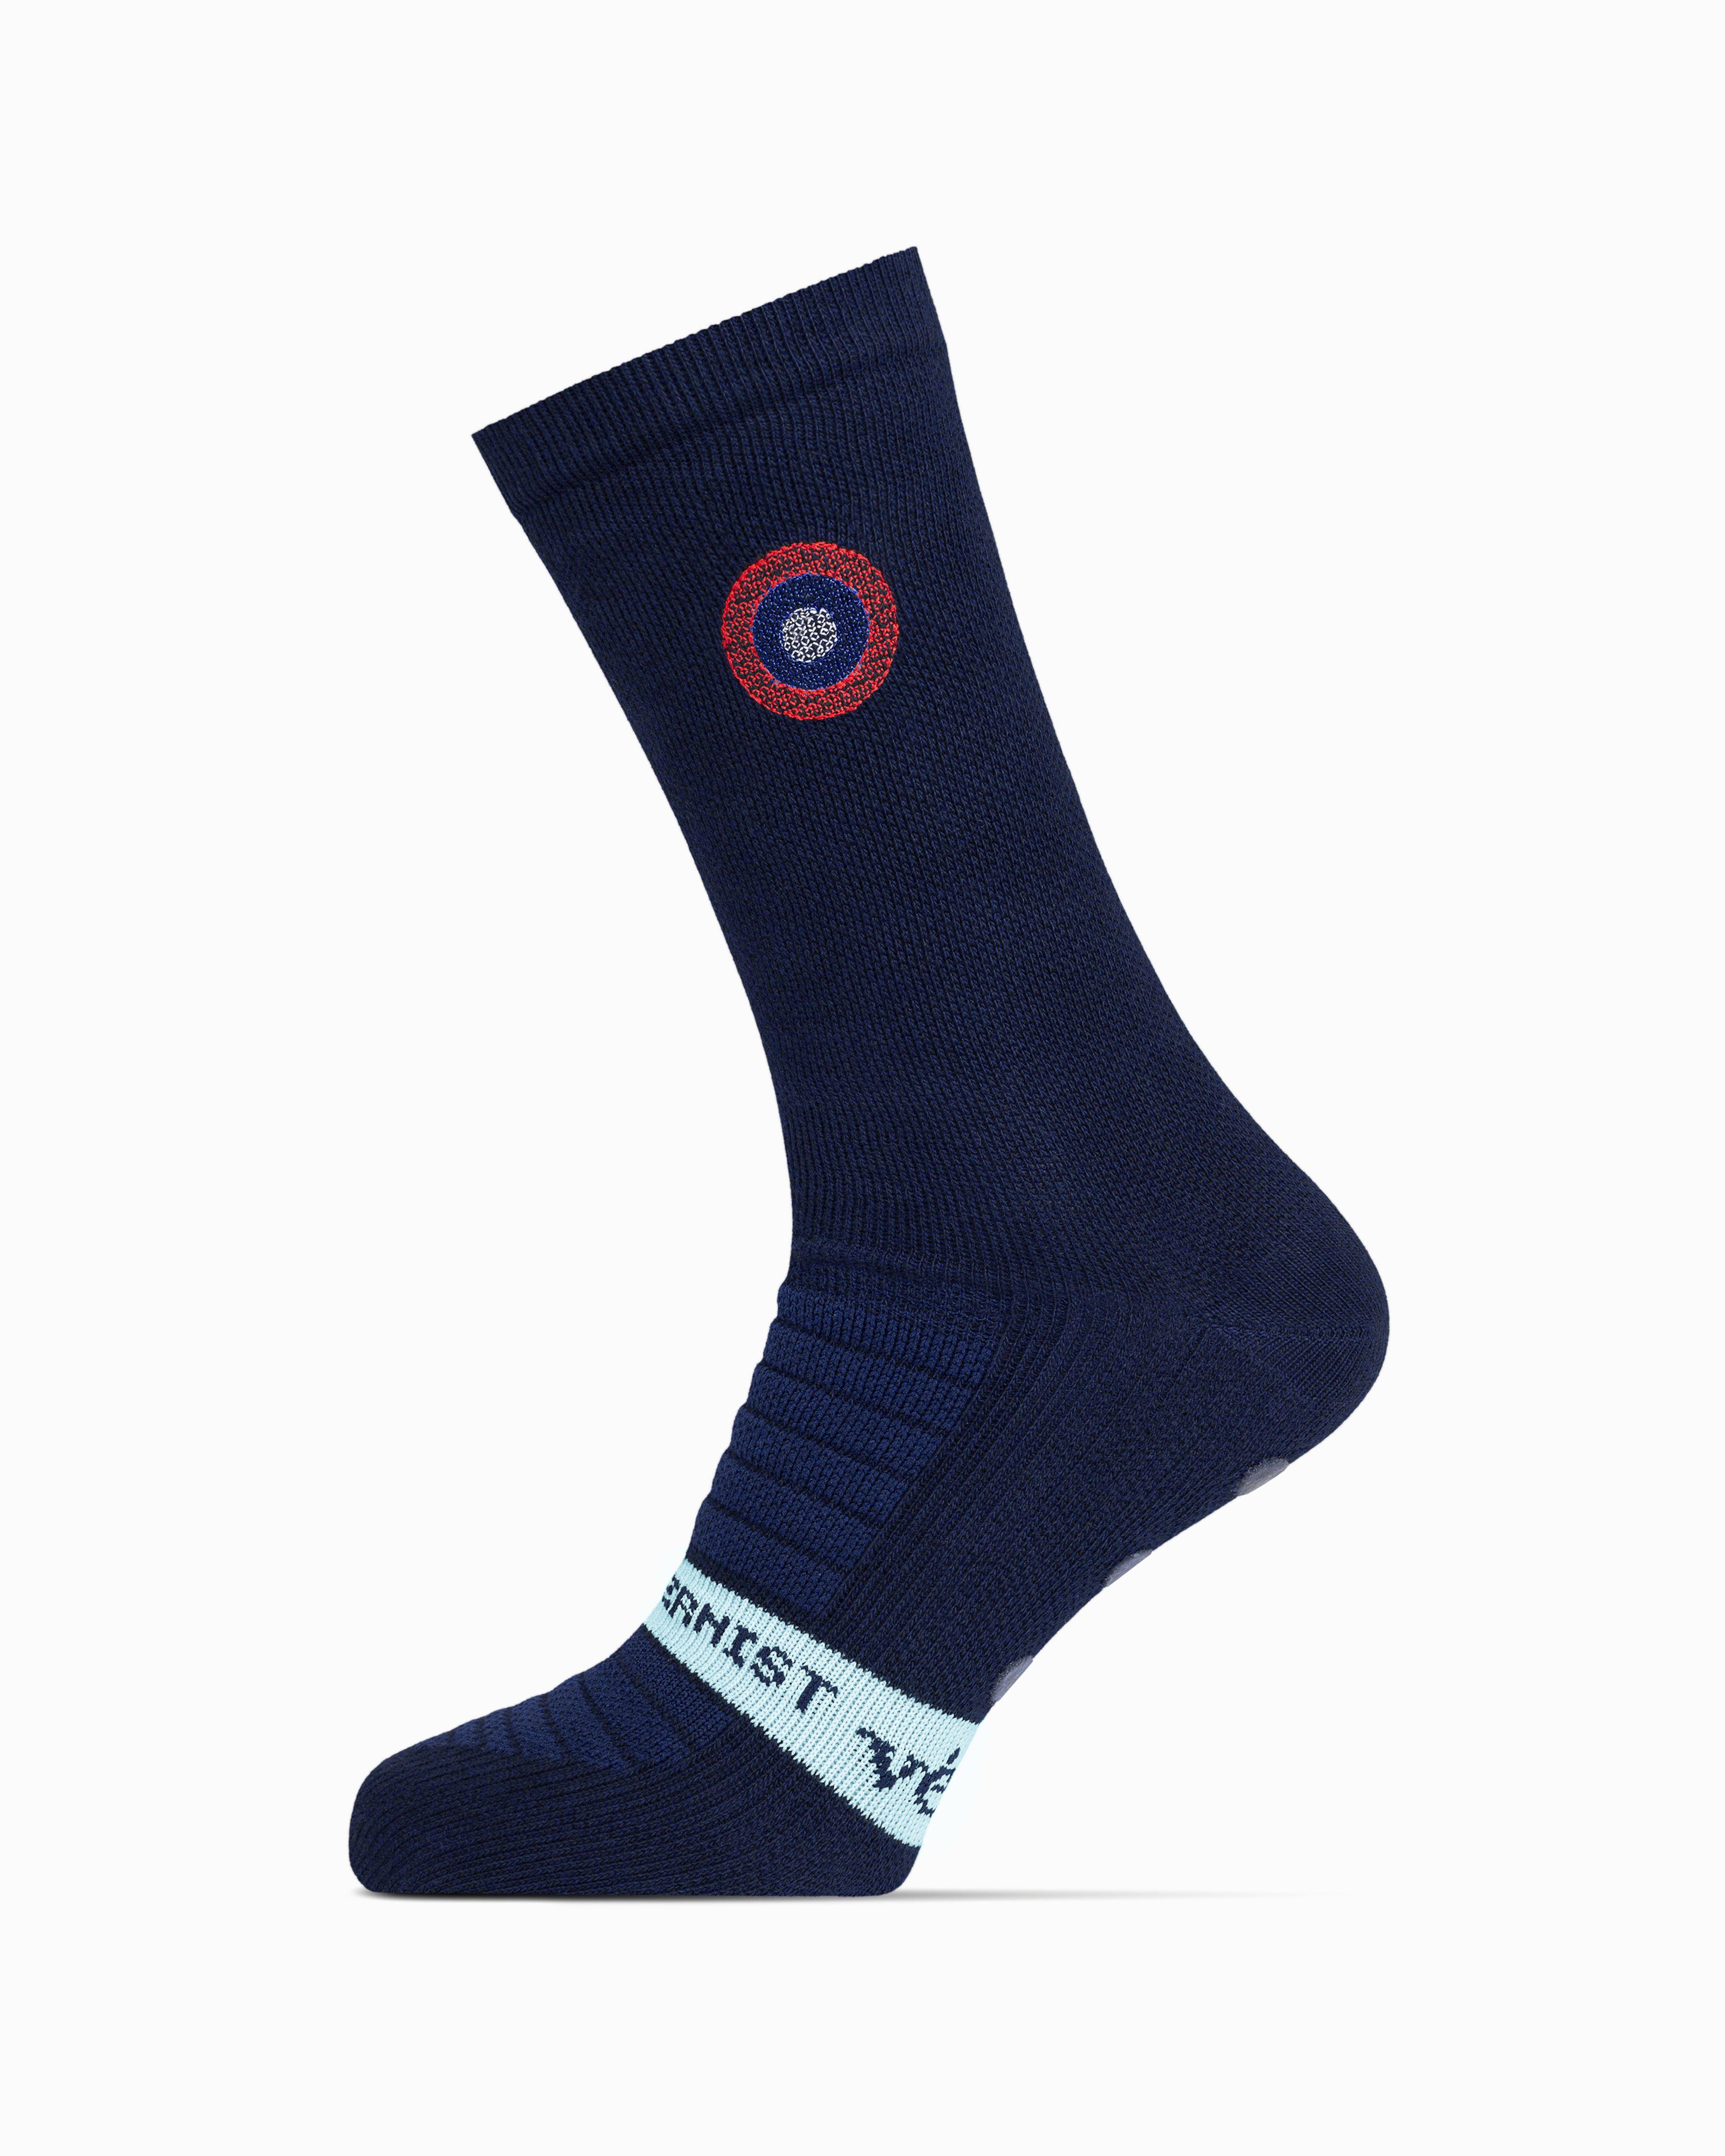 Modernist PremGripp Socks (Navy)